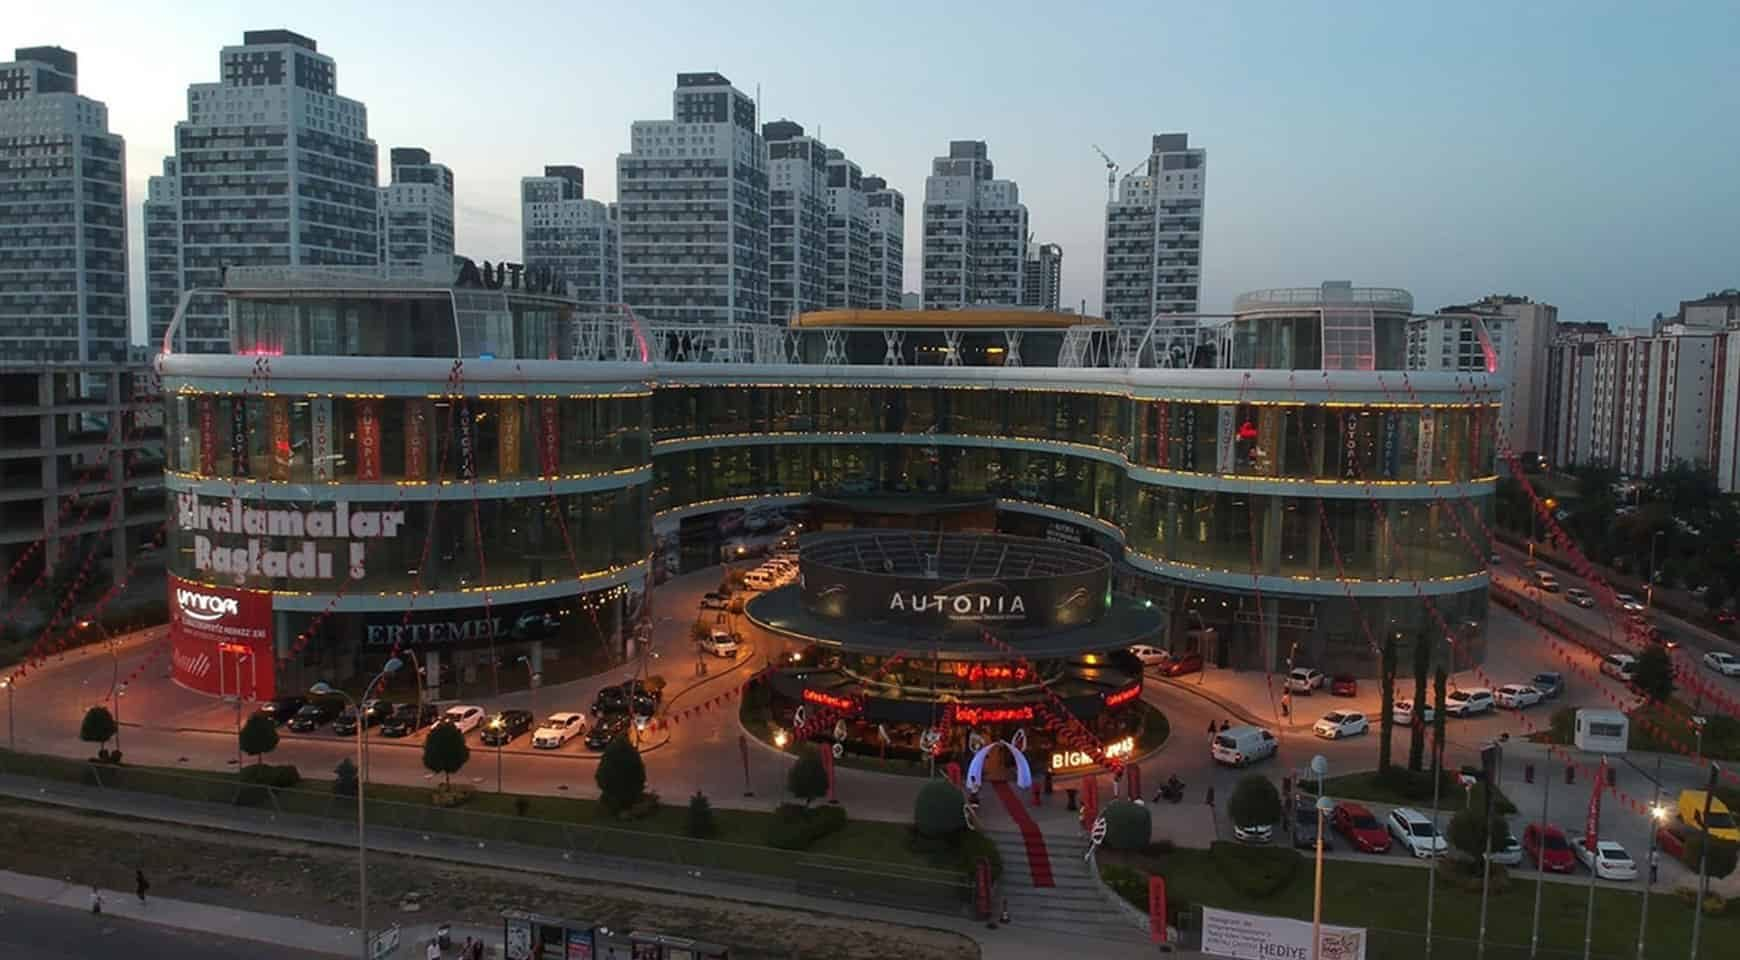 Autopia, Commercial C, Istanbul - Ud Turkey